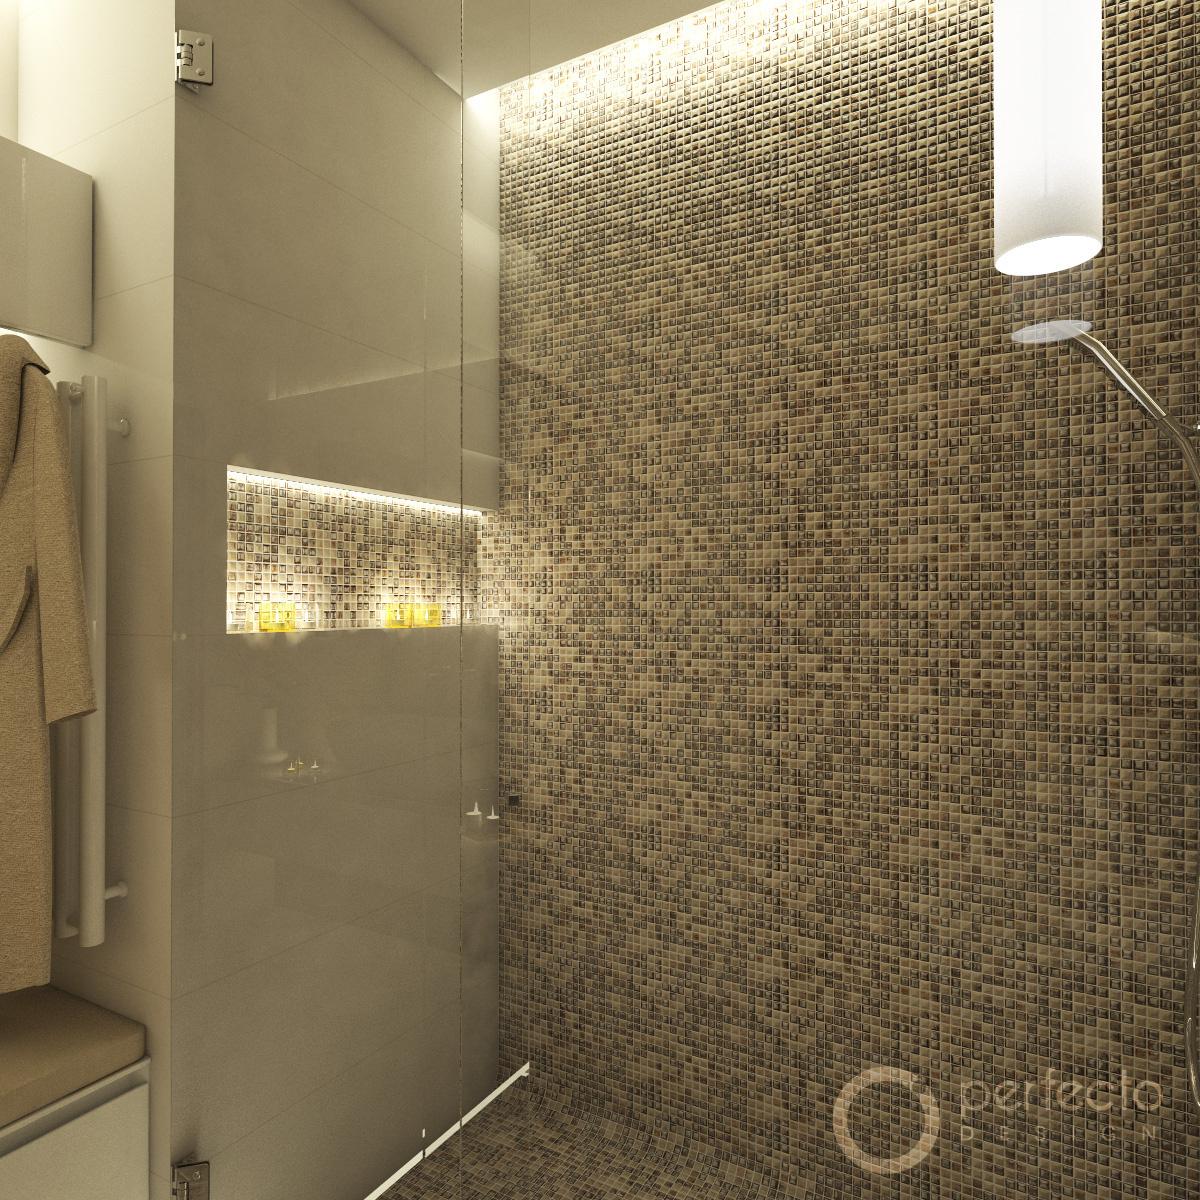 Luxus Badezimmer  Jtleigh.com - Hausgestaltung Ideen